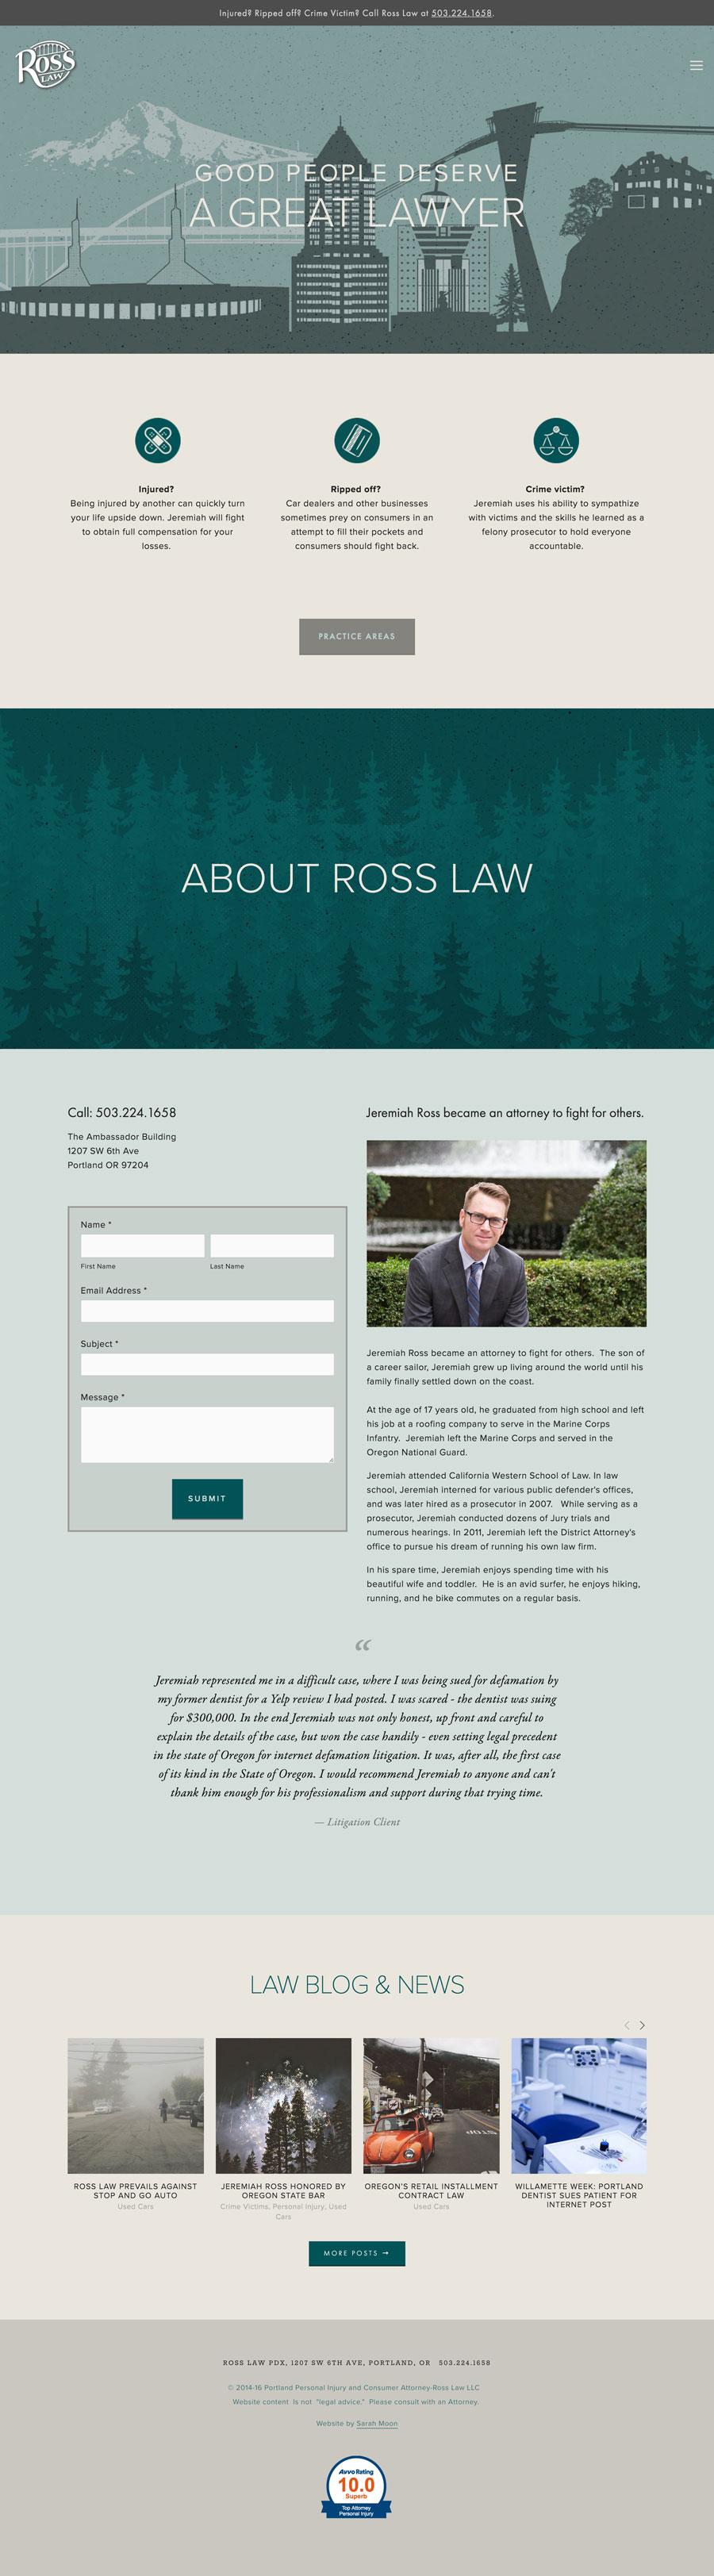 Website design for Portland attorney Jeremiah Ross, rosslawpdx.com; Design by Sarah Moon - sarahmoon.net